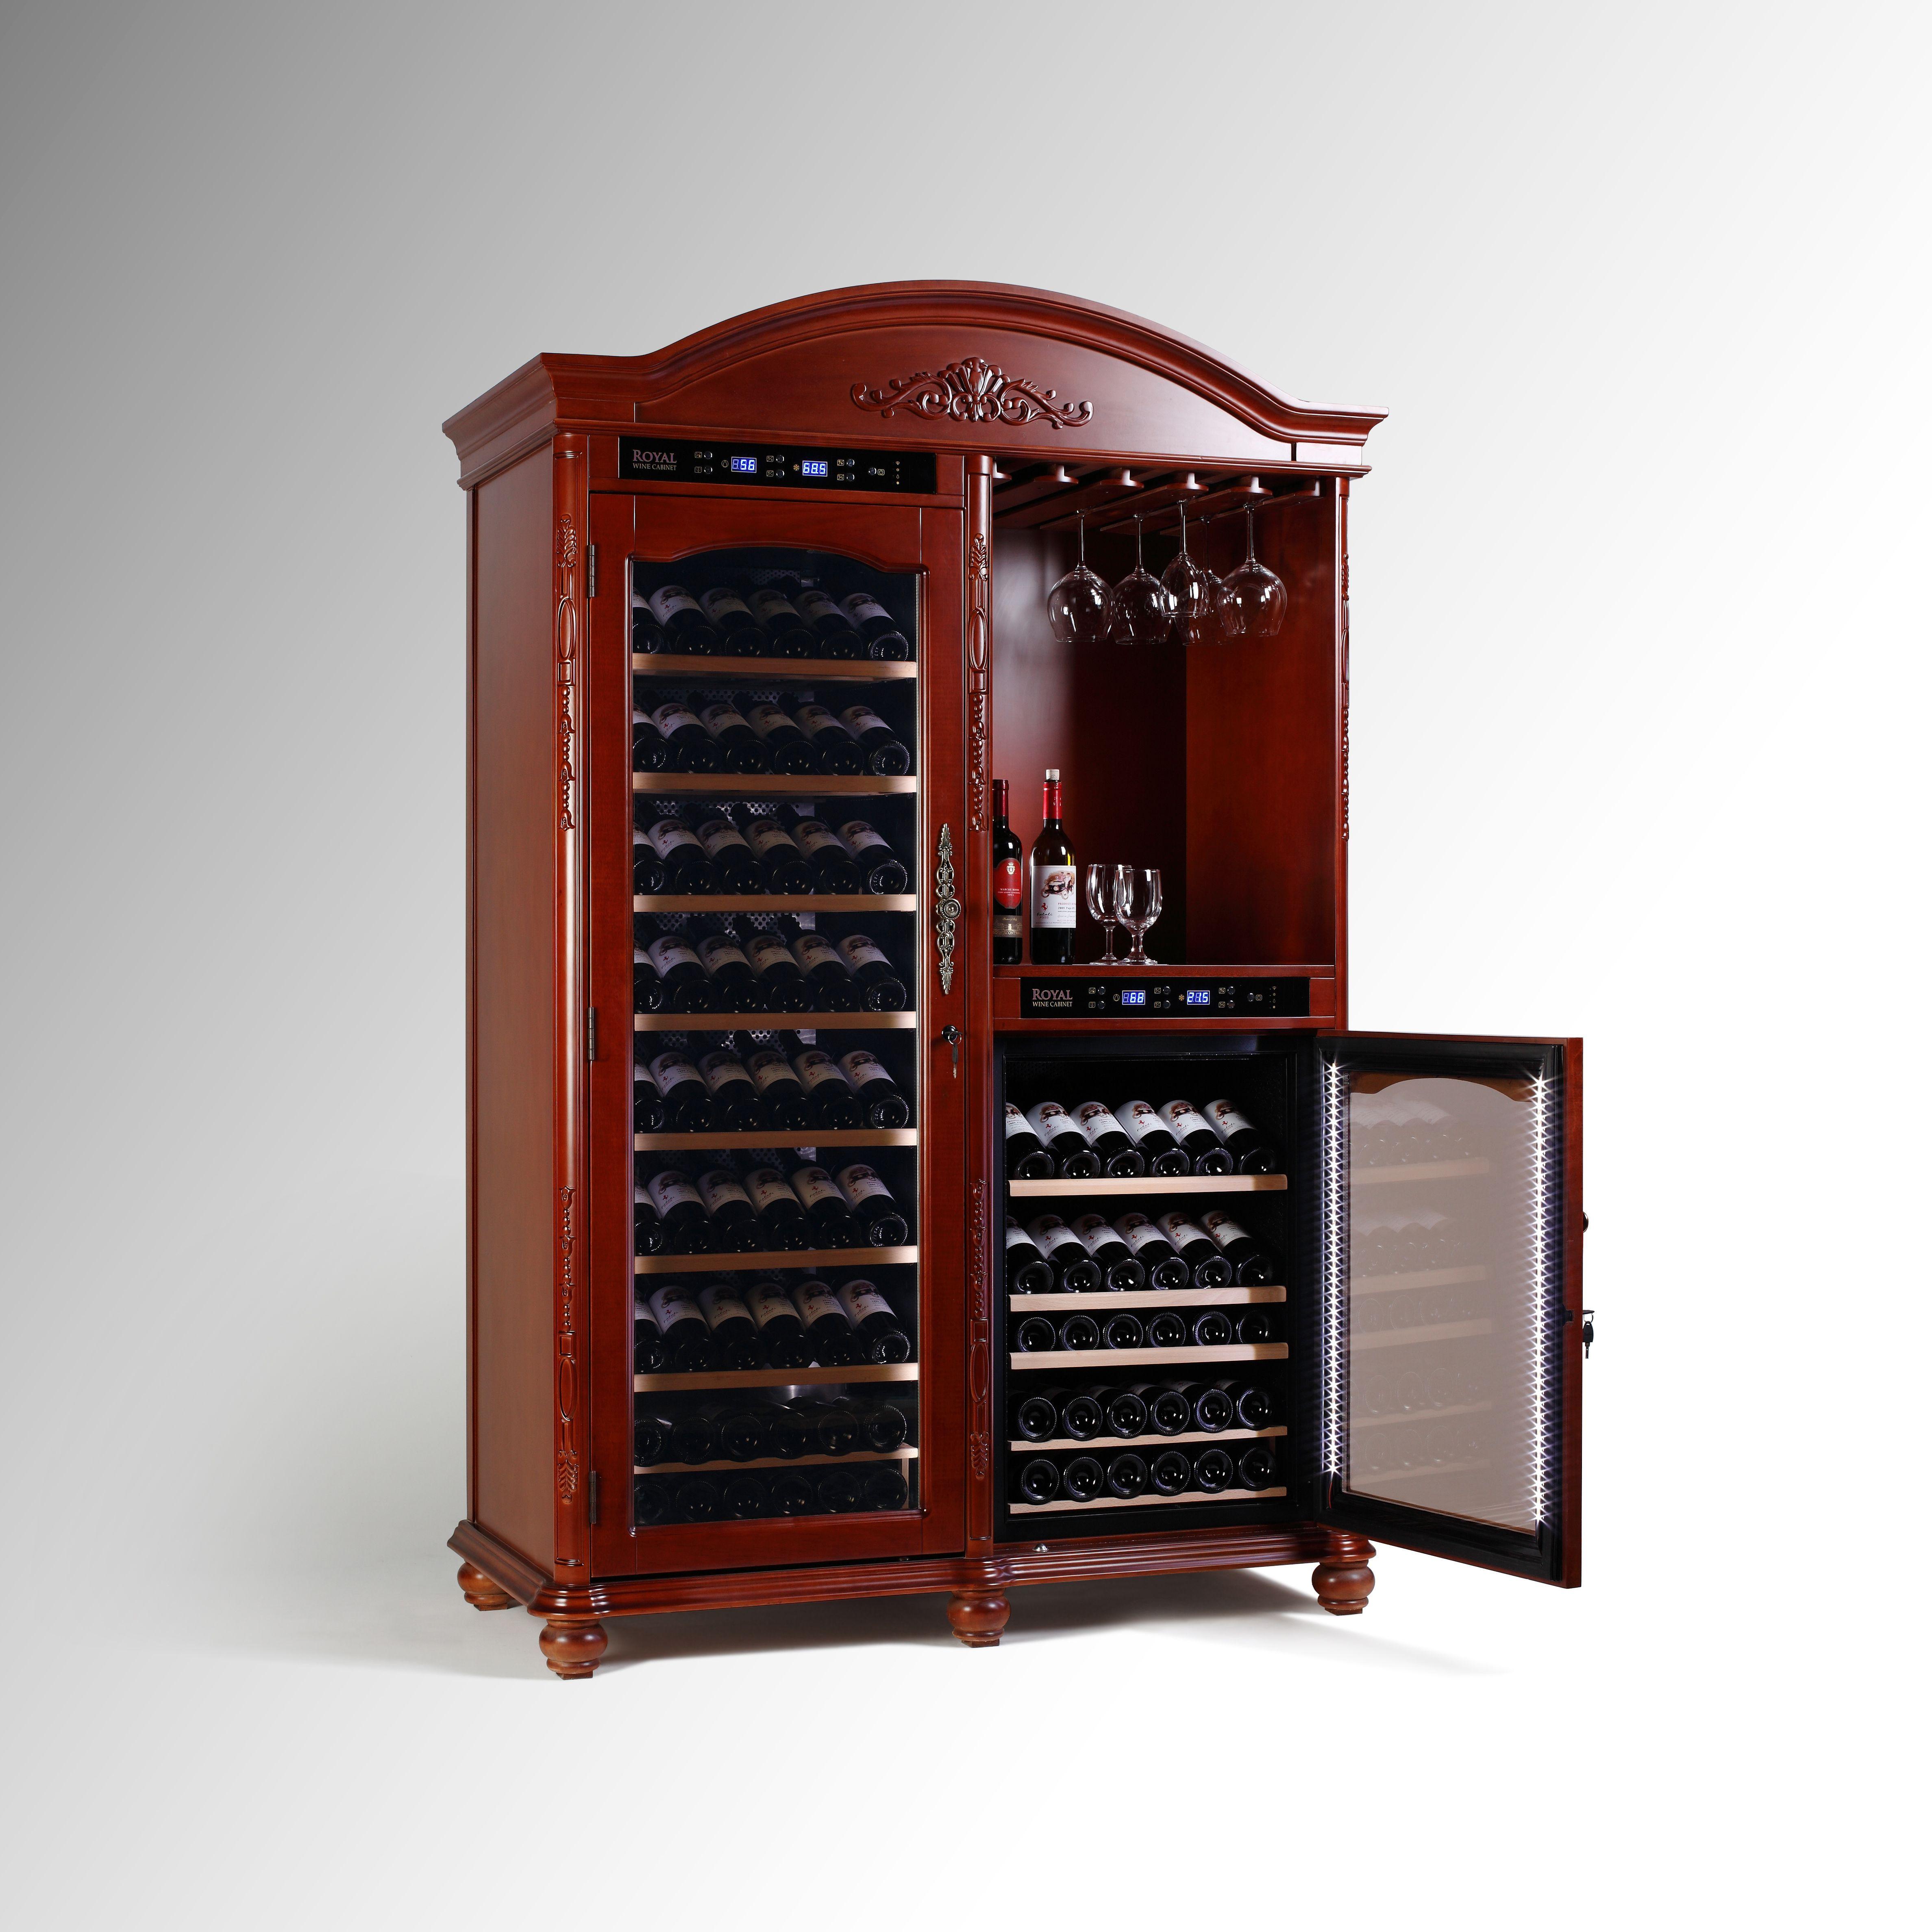 Home Decoration Furniture Climate Controlled Wine Cellar Cabinet 232 Bottles Http Vinbro Com Decoracion De Unas Cava